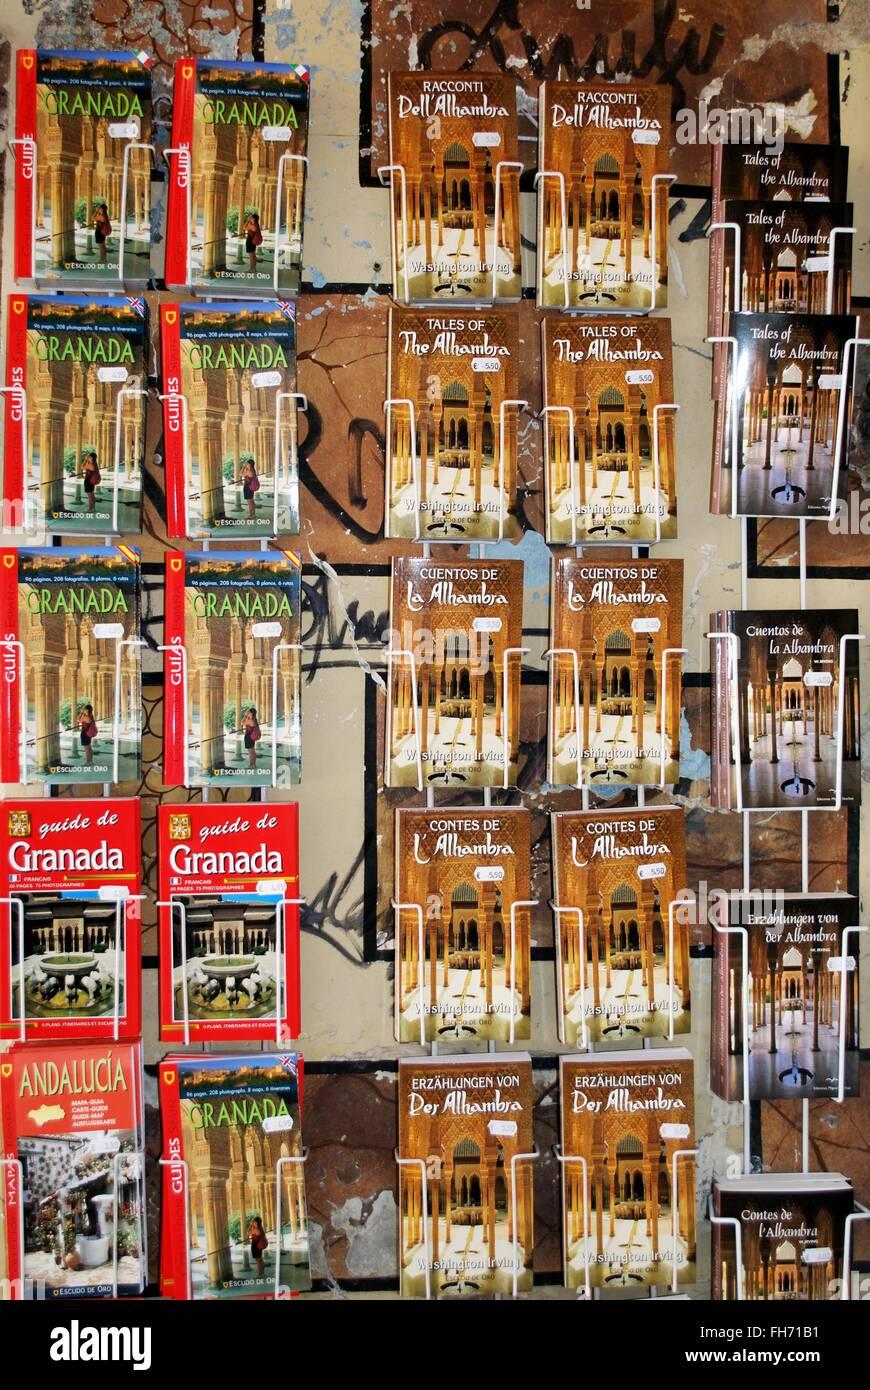 Book Shop Maps Stock Photos & Book Shop Maps Stock Images - Alamy